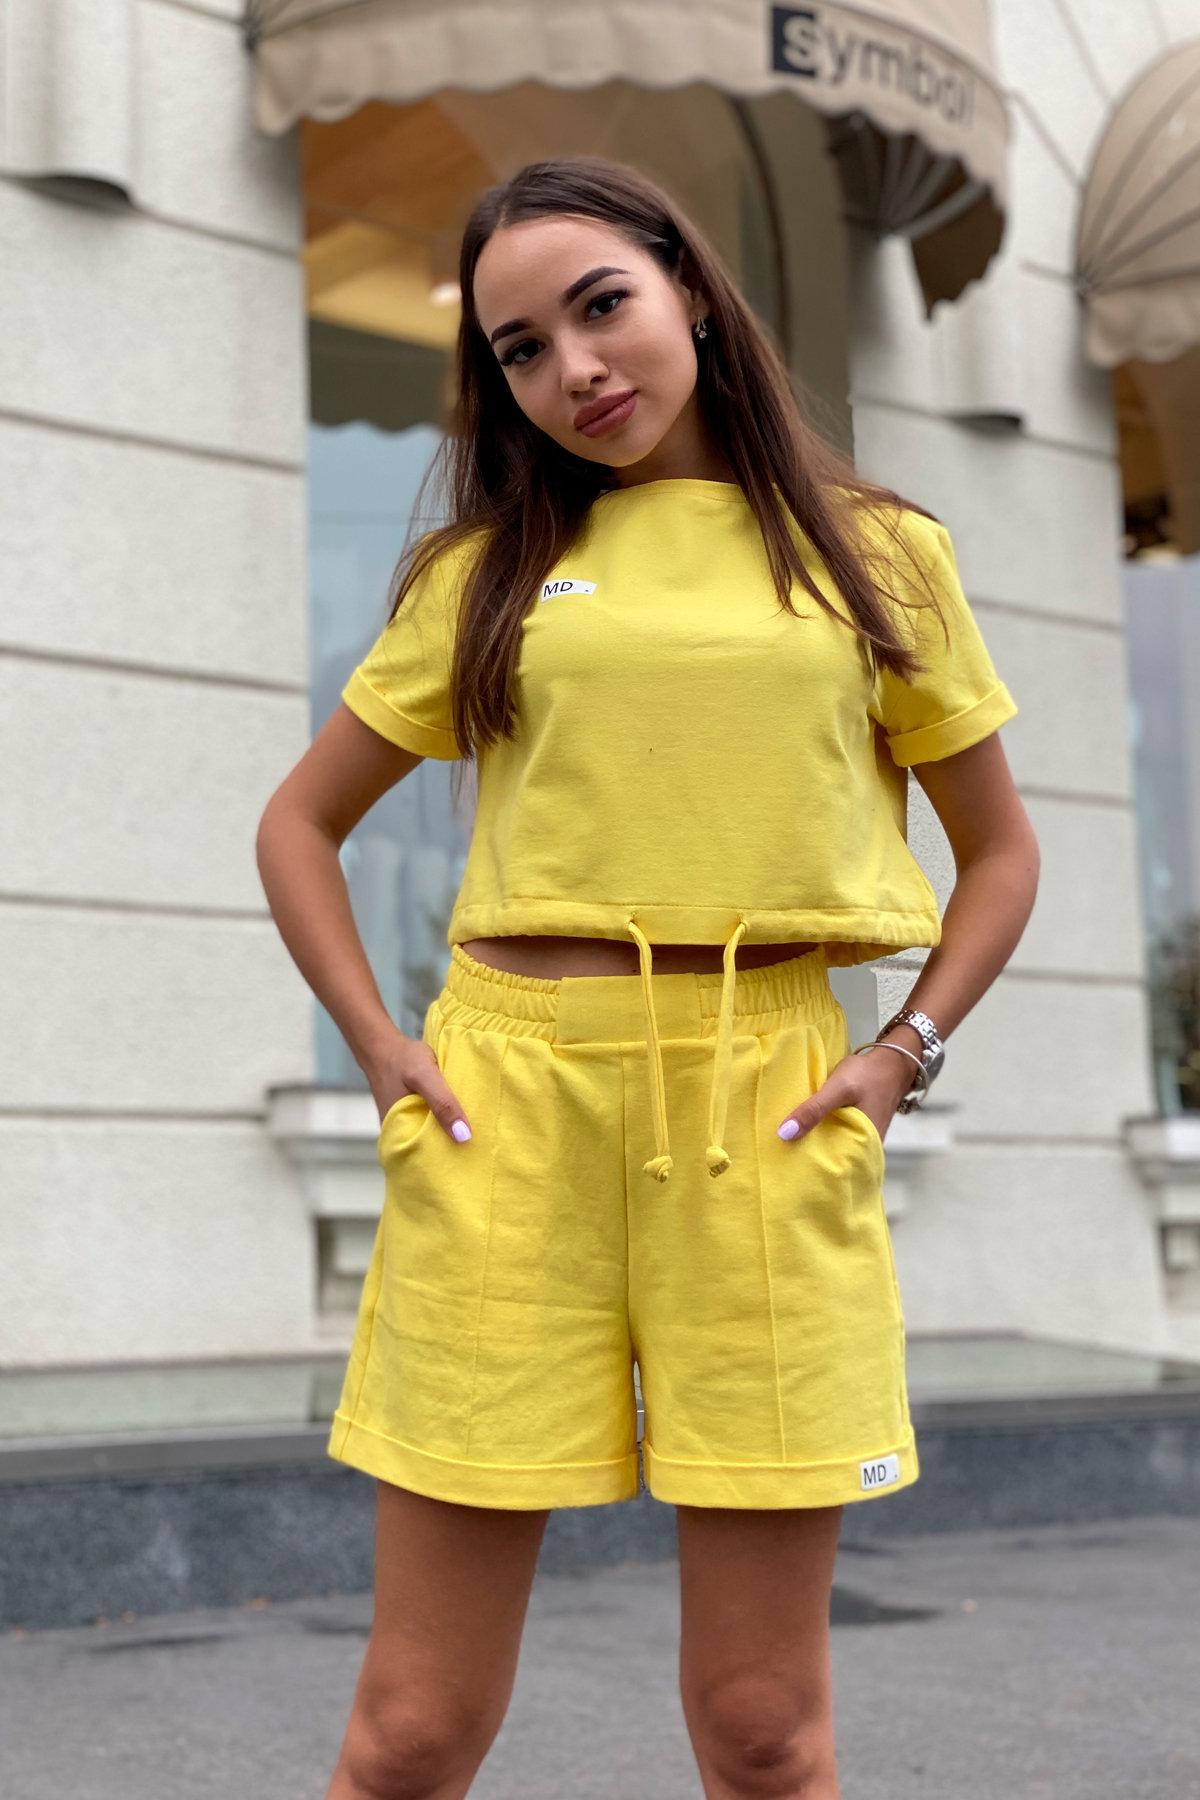 Костюм Фреш 9252 АРТ. 45823 Цвет: Желтый - фото 4, интернет магазин tm-modus.ru